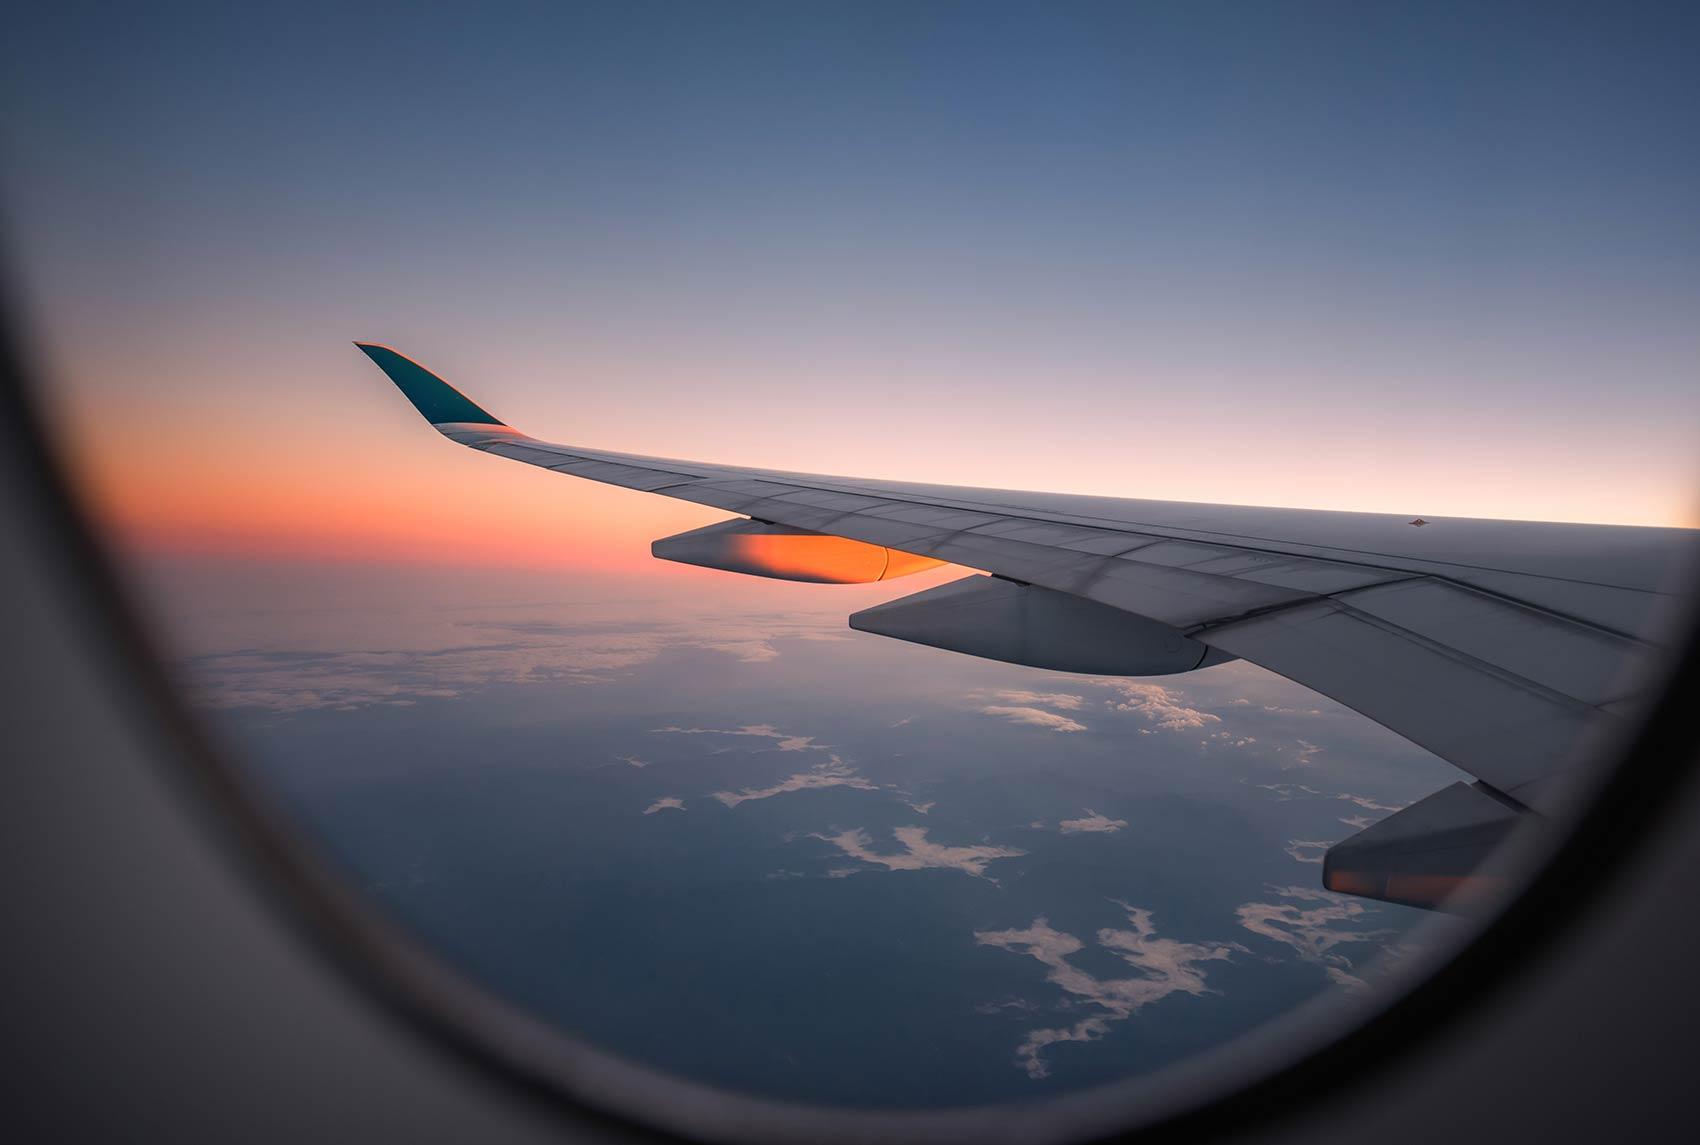 28. godišnja konferencija European Air Law Association (EALA)